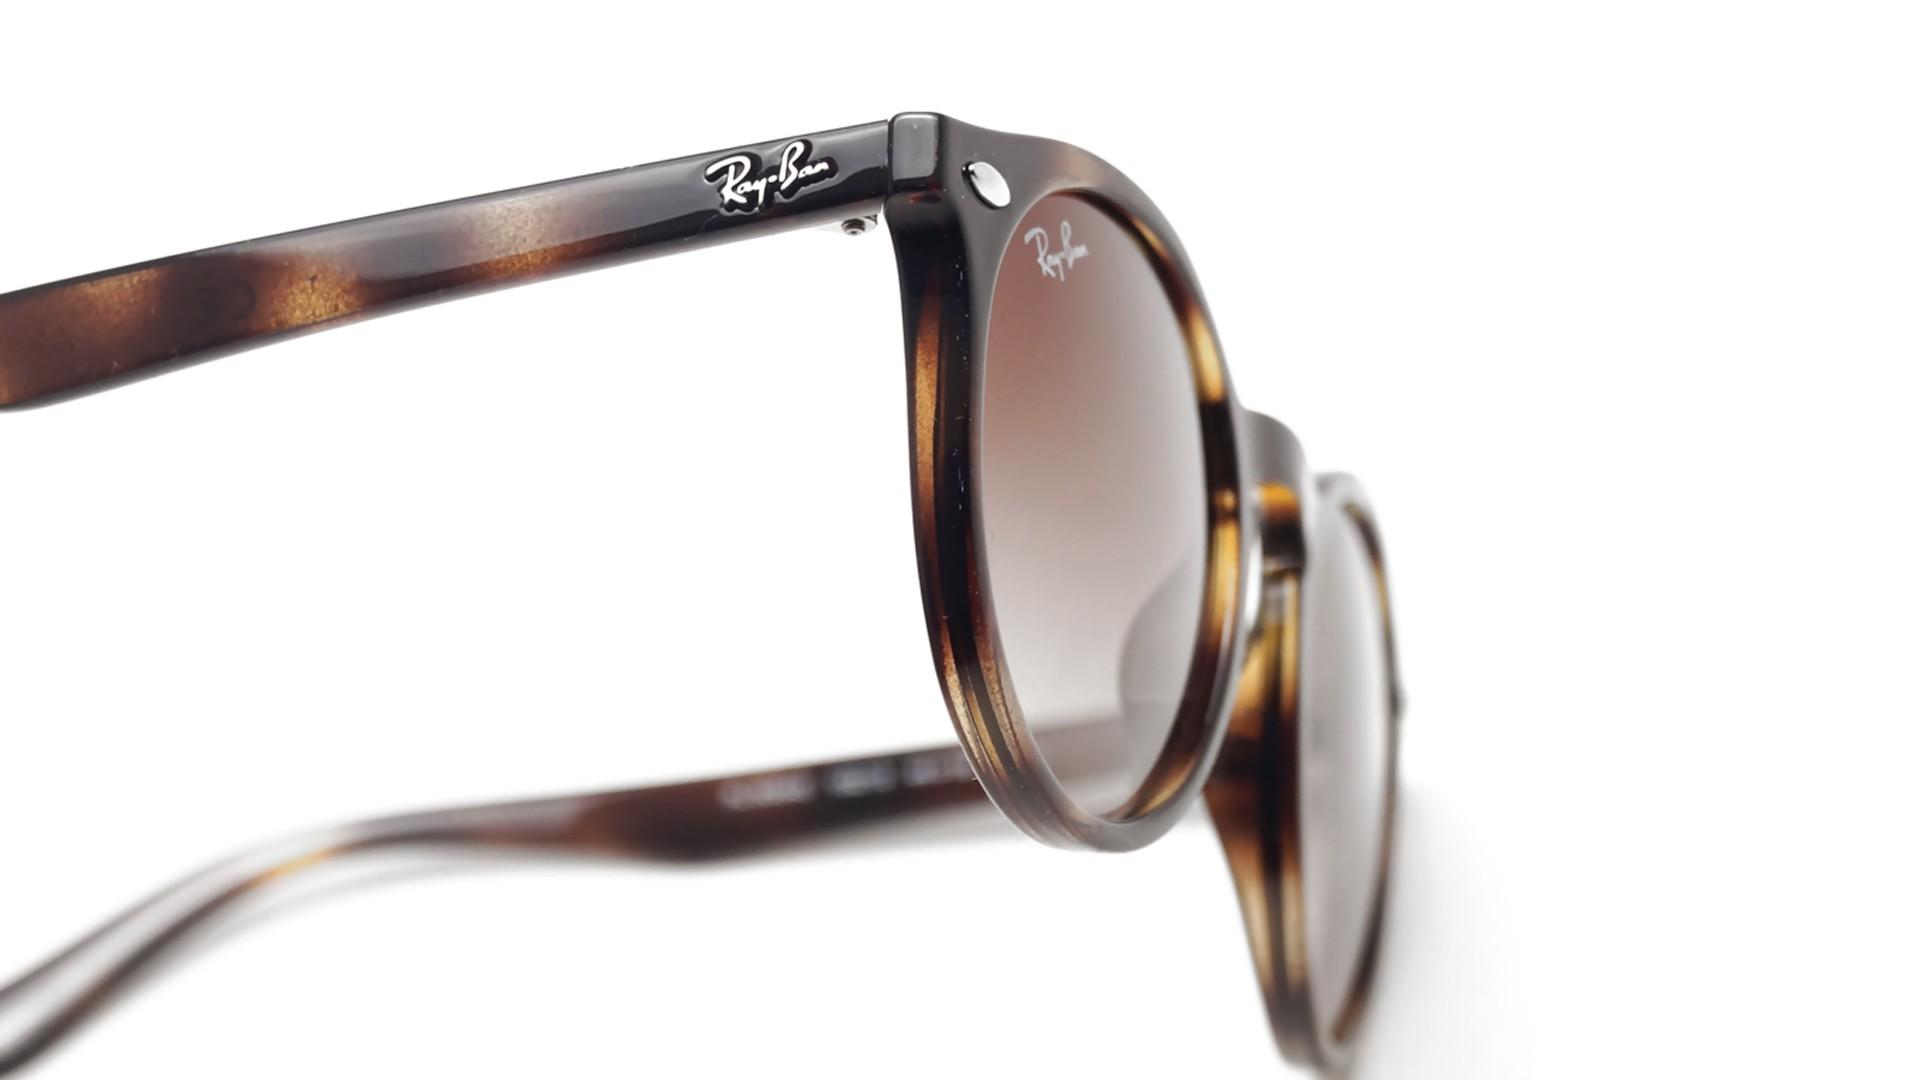 ce3b89f734f549 Sunglasses Ray-Ban RJ9064S 152 13 44-19 Tortoise Junior Gradient